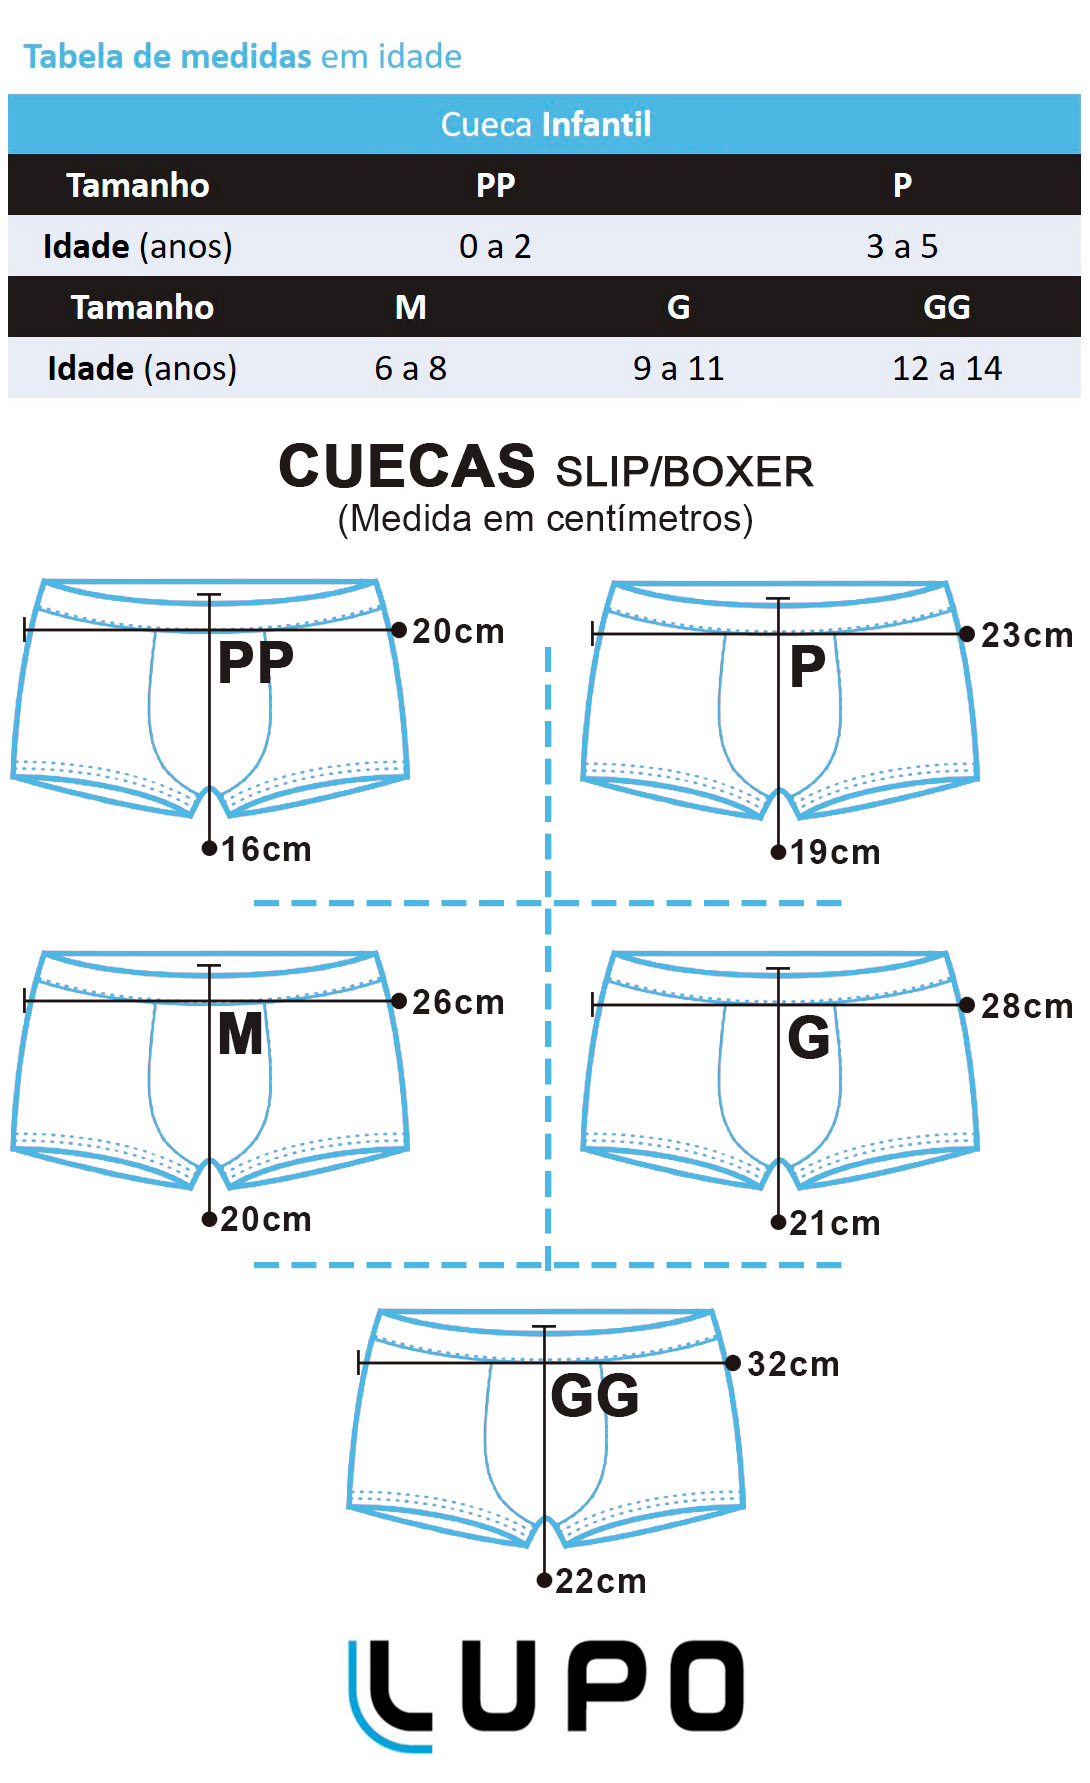 Cueca Ceroula Infantil Preta - Lupo: Tabela de medidas